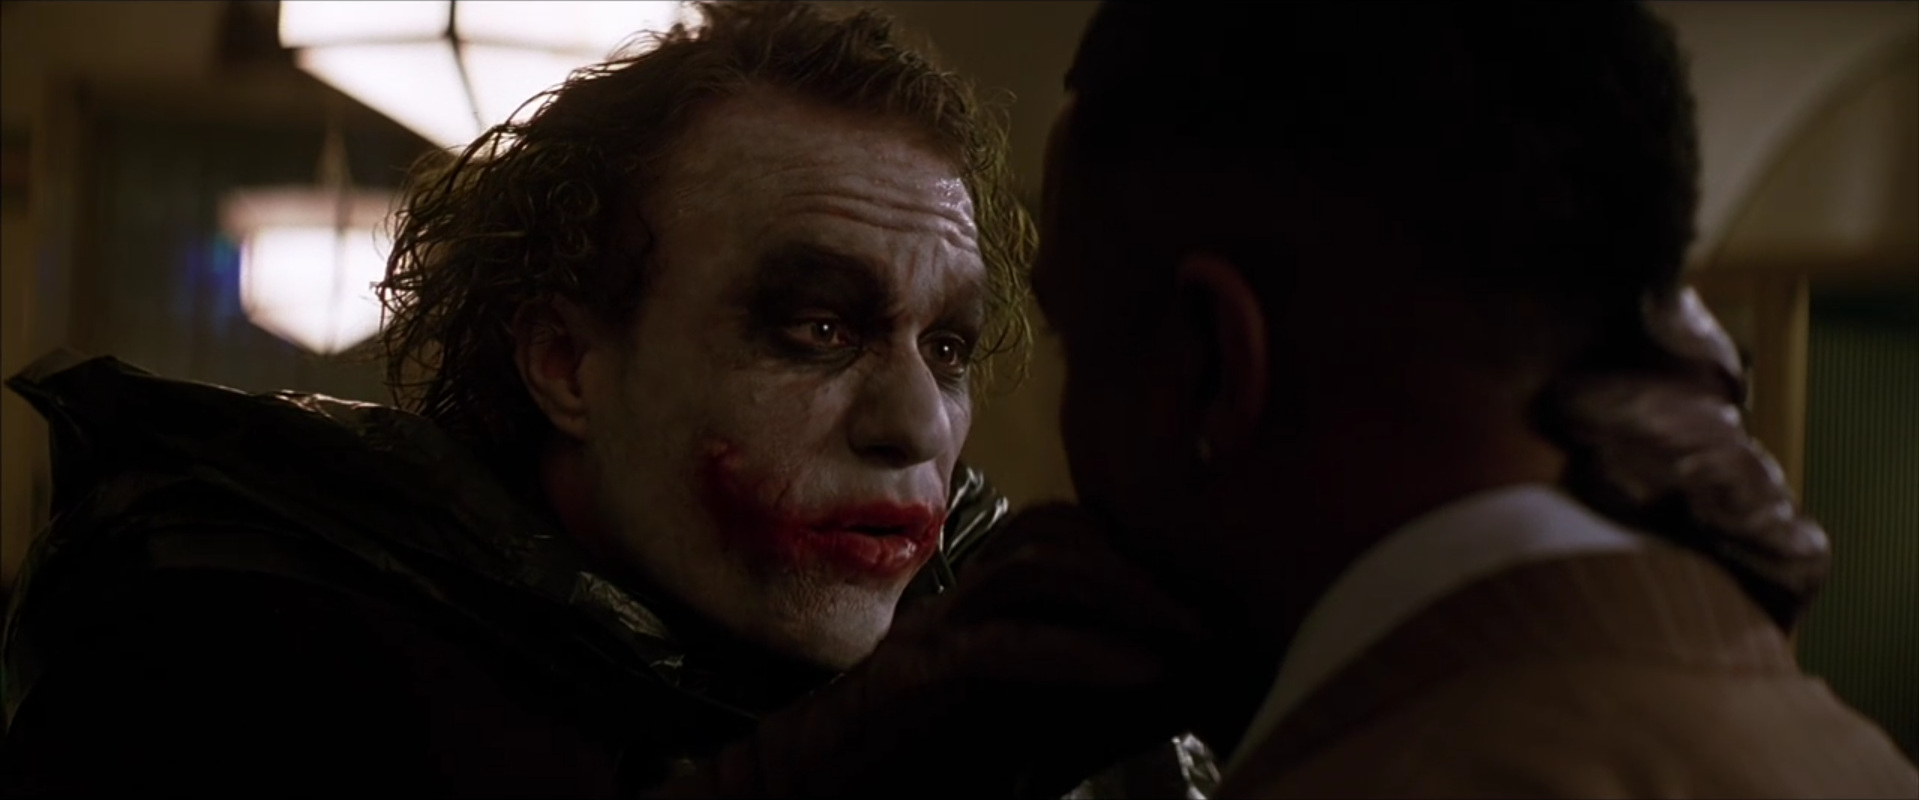 The Dark Knight  (2008): the inscrutable Joker/terrorist enemy